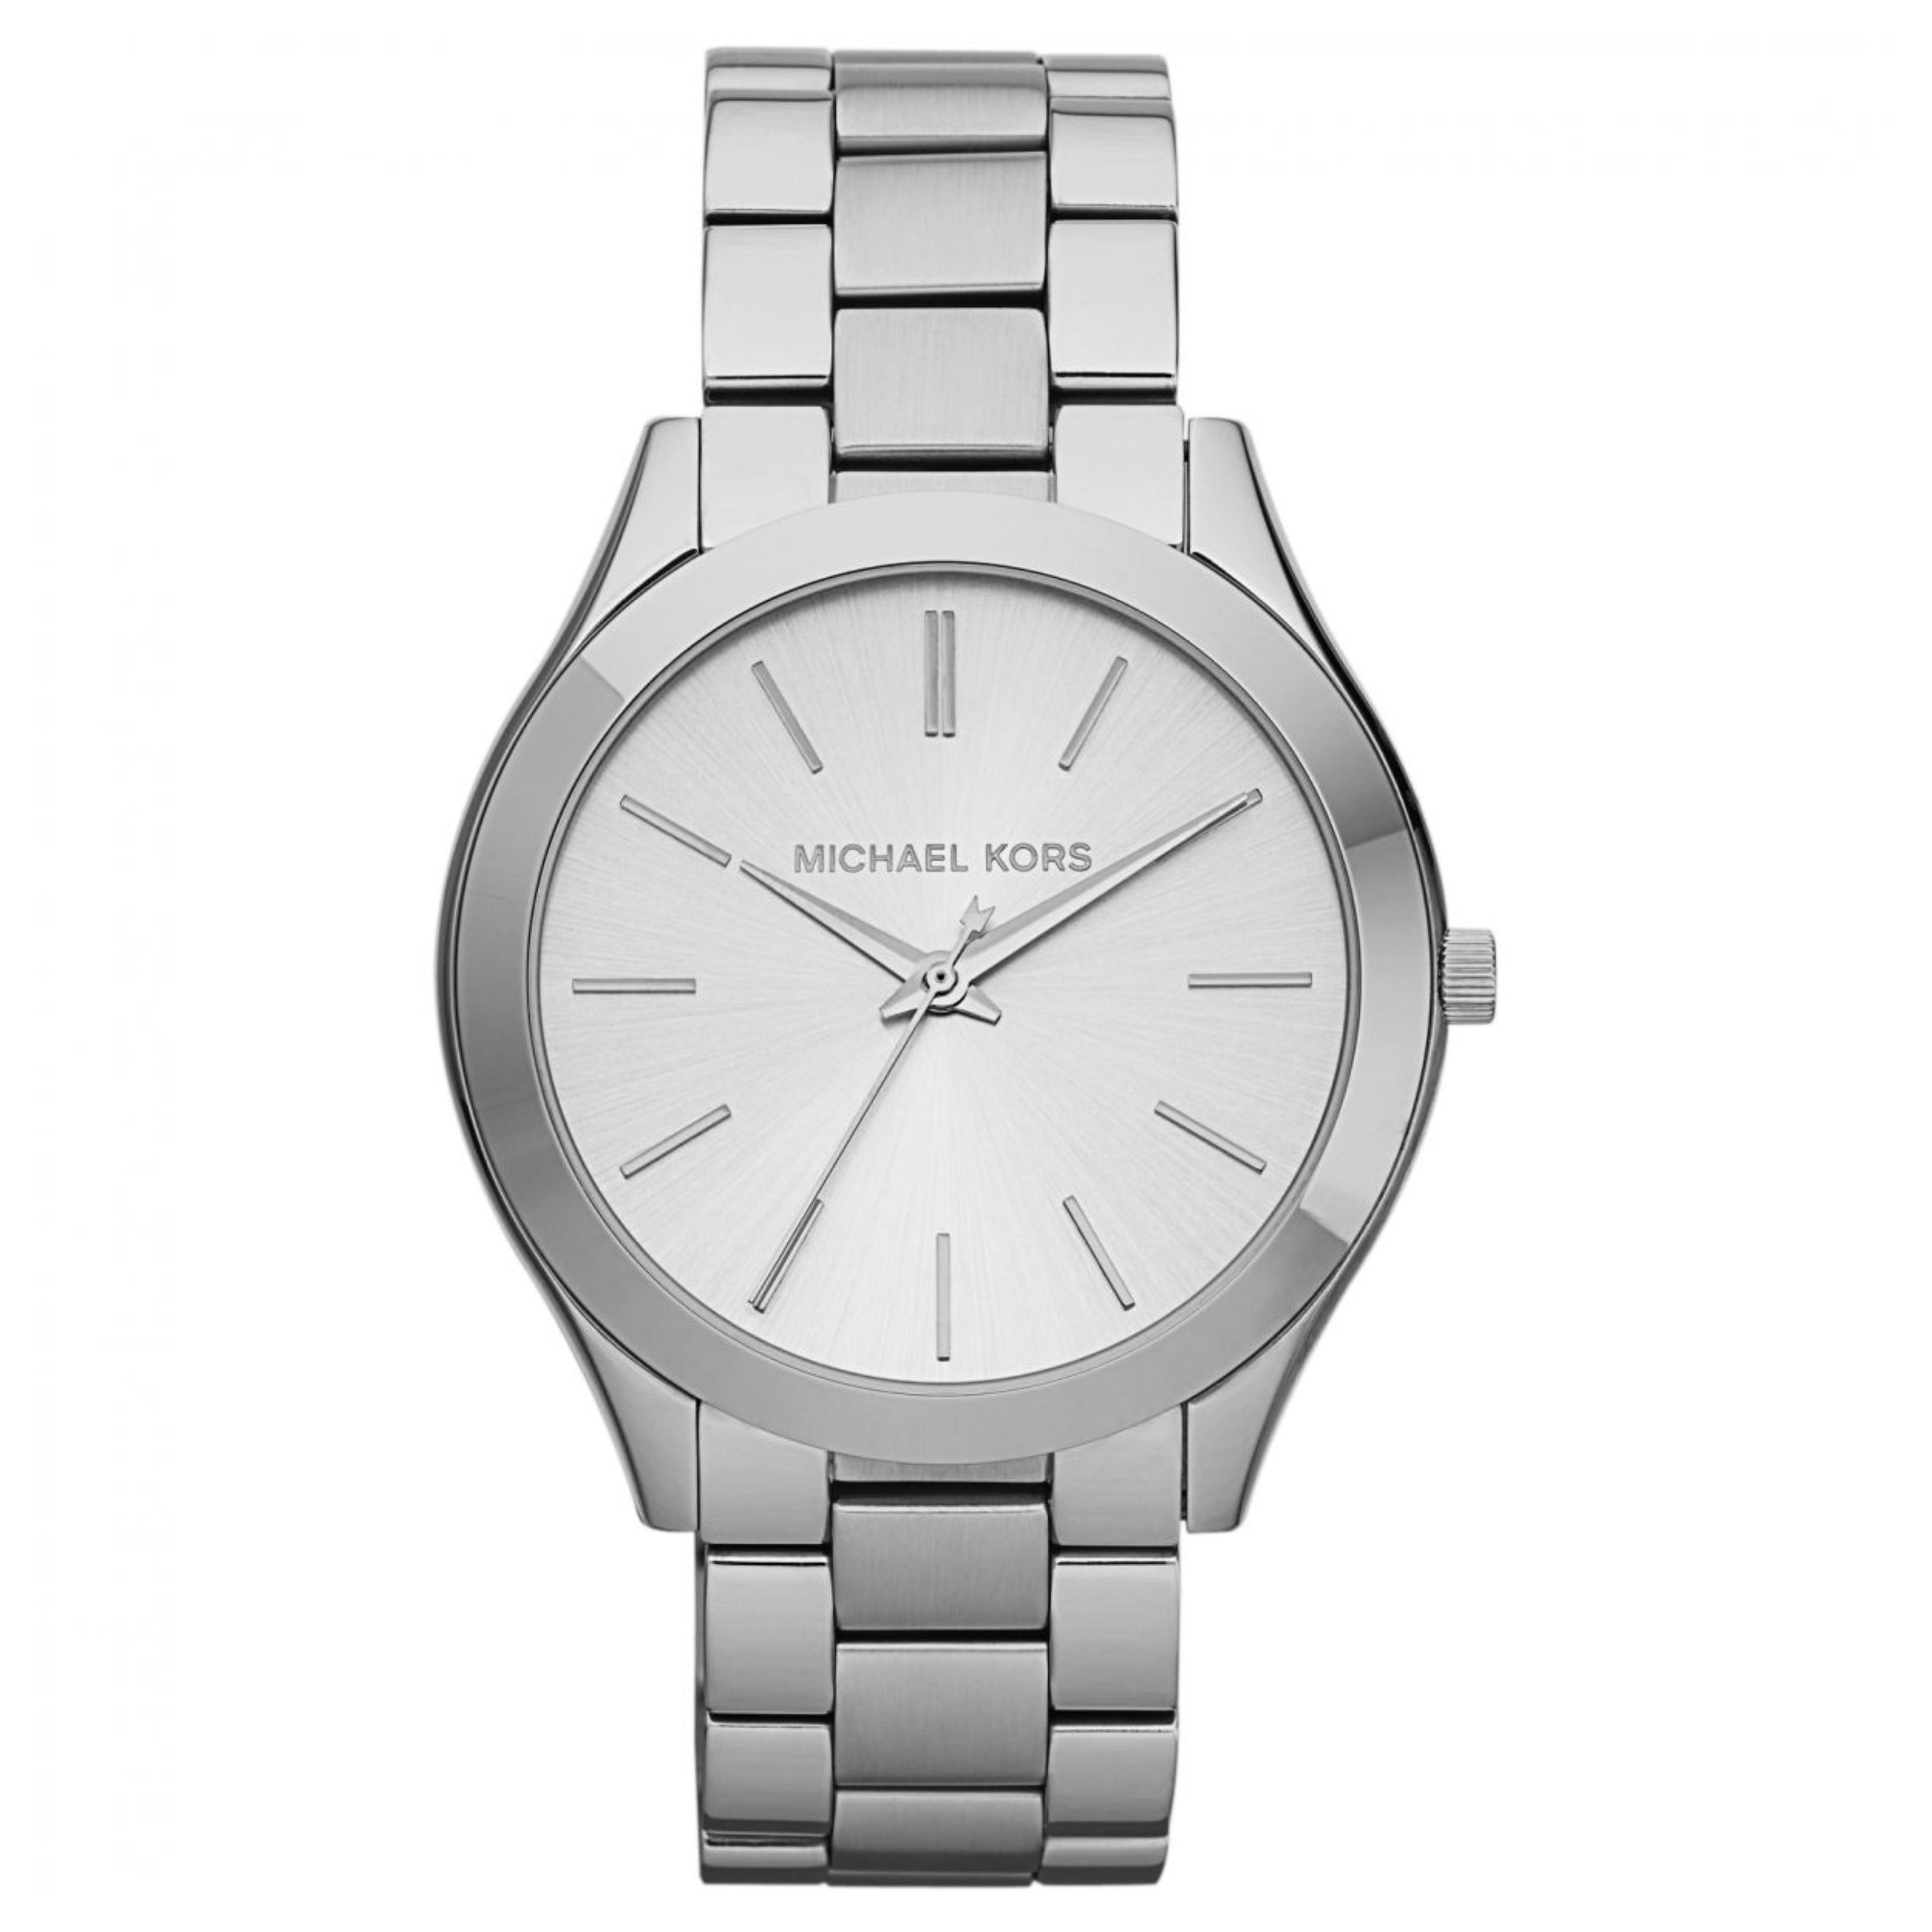 Michael Kors Runway Ultra Slim Women Watch|Silver Tone Dial|Bracelet Band|MK3178